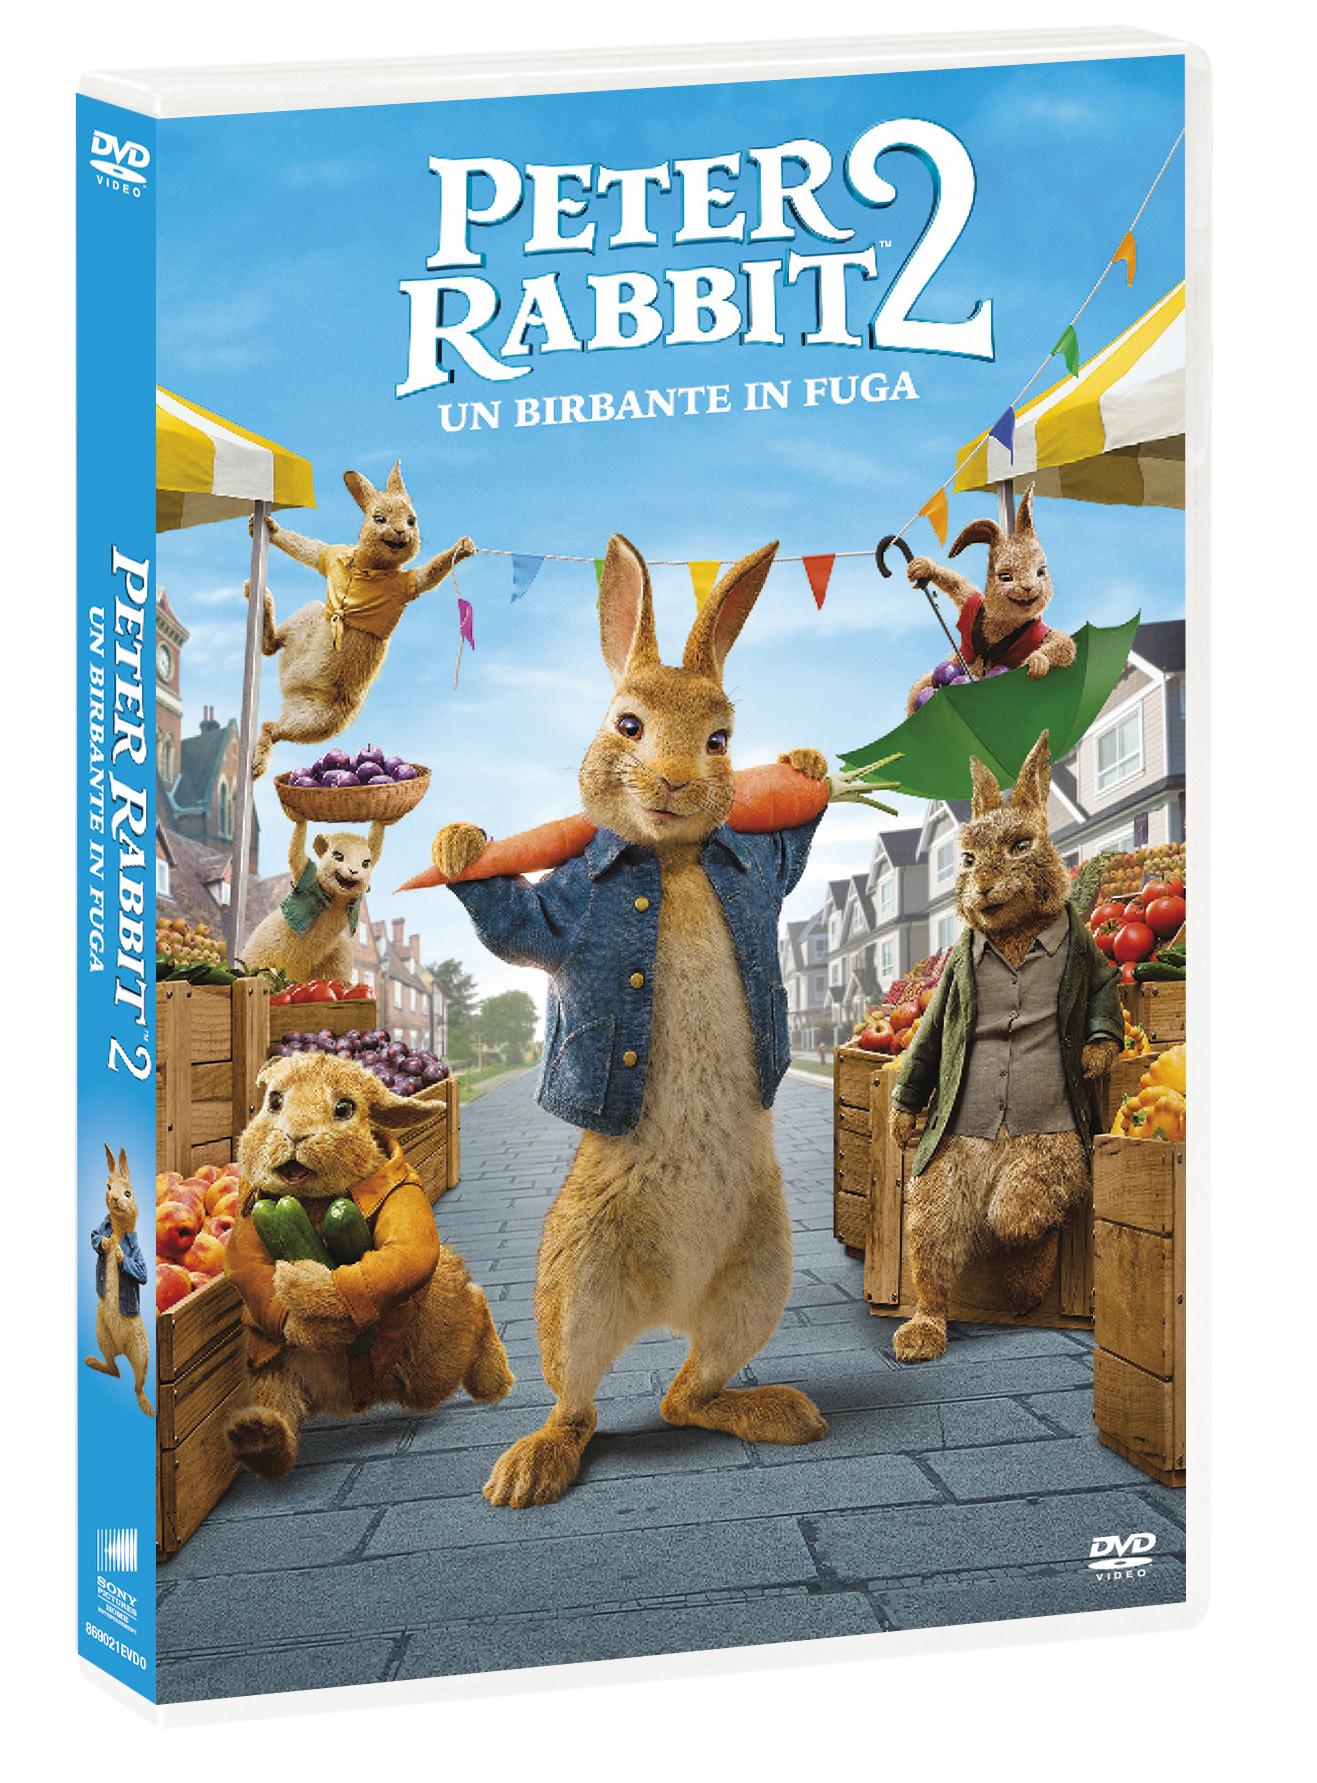 PETER RABBIT 2 - UN BIRBANTE IN FUGA (DVD)